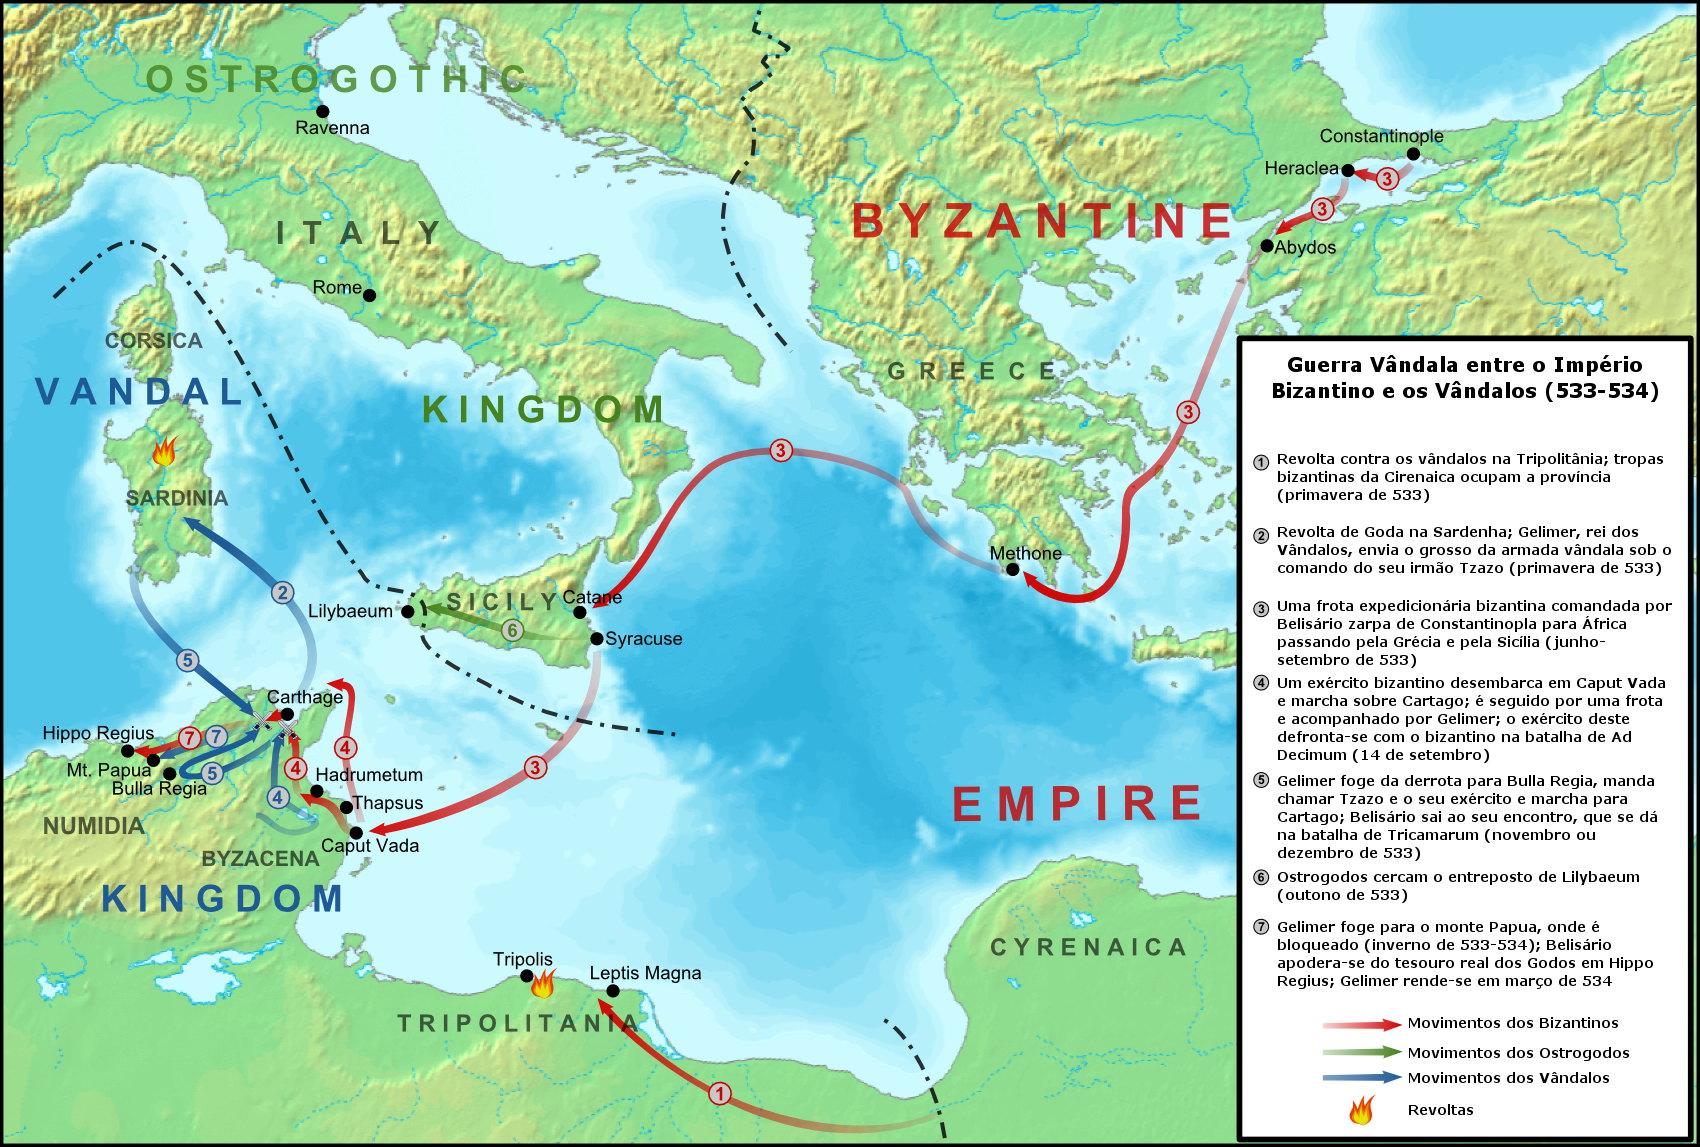 File Mapa Da Guerra Vandala Jpg Wikimedia Commons